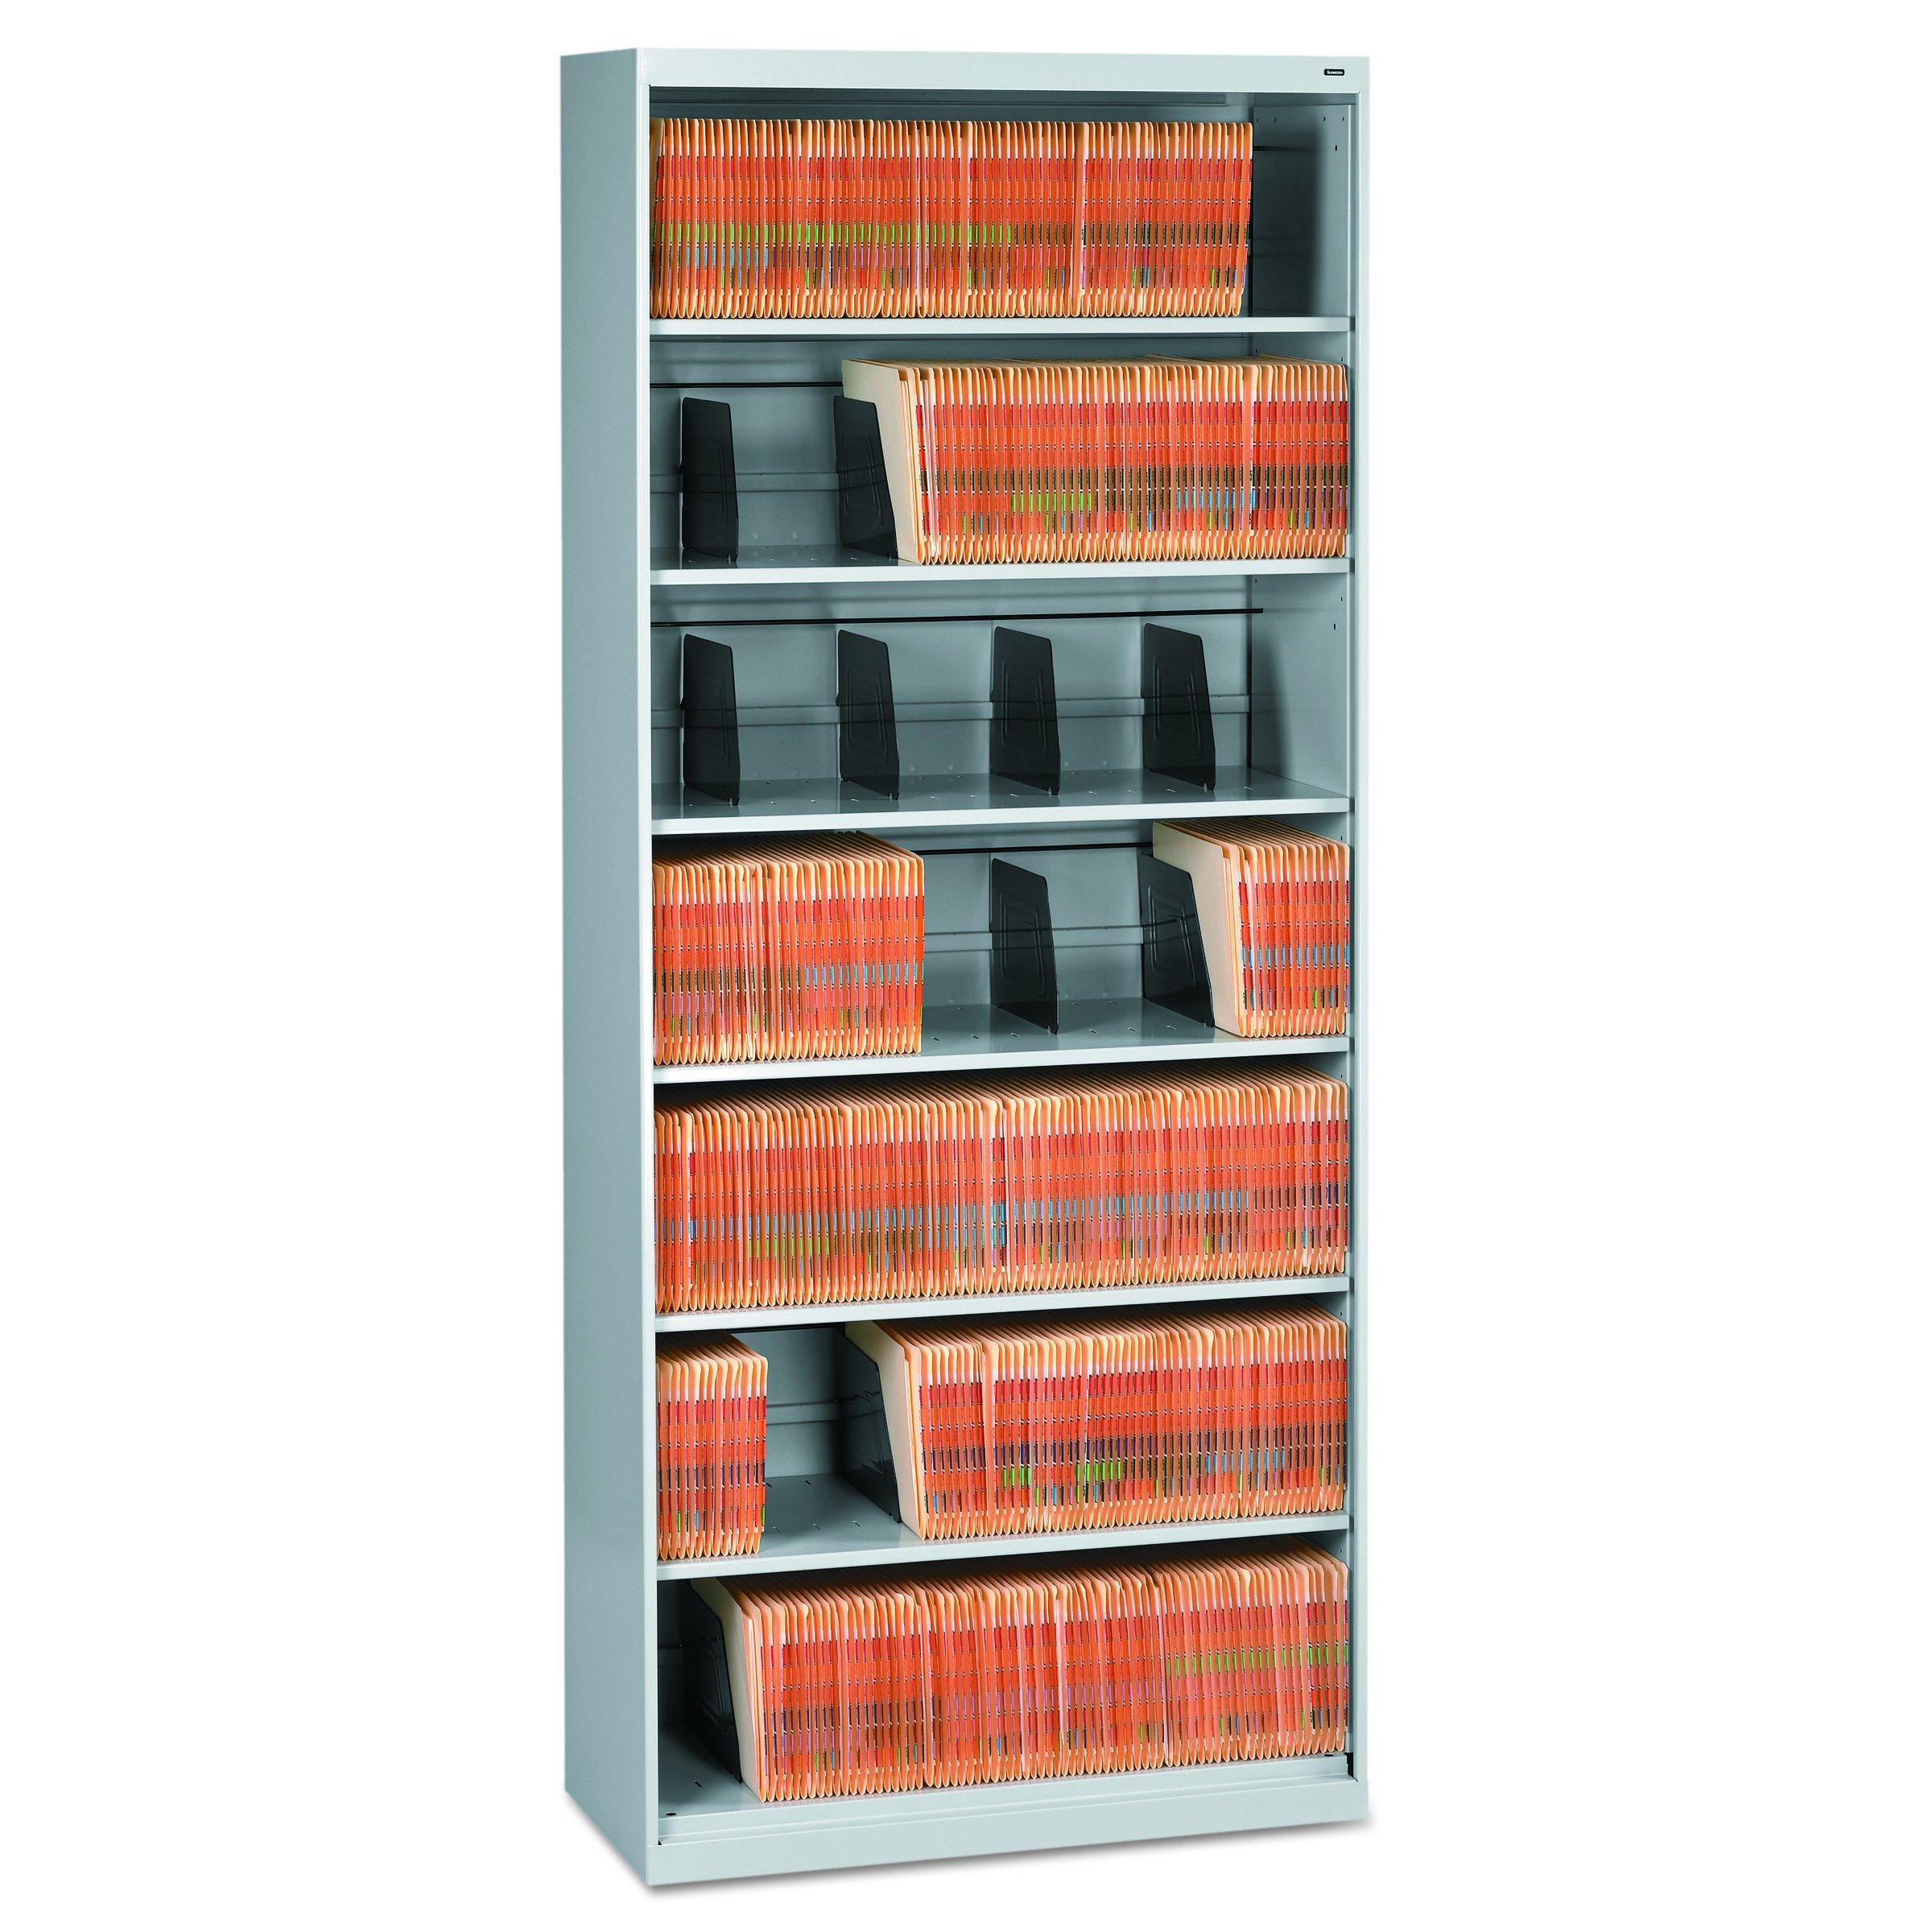 Tennsco Open Fixed Shelf Lateral File, 36w x 16 1/2d x 87h, Light Gray by Tennsco